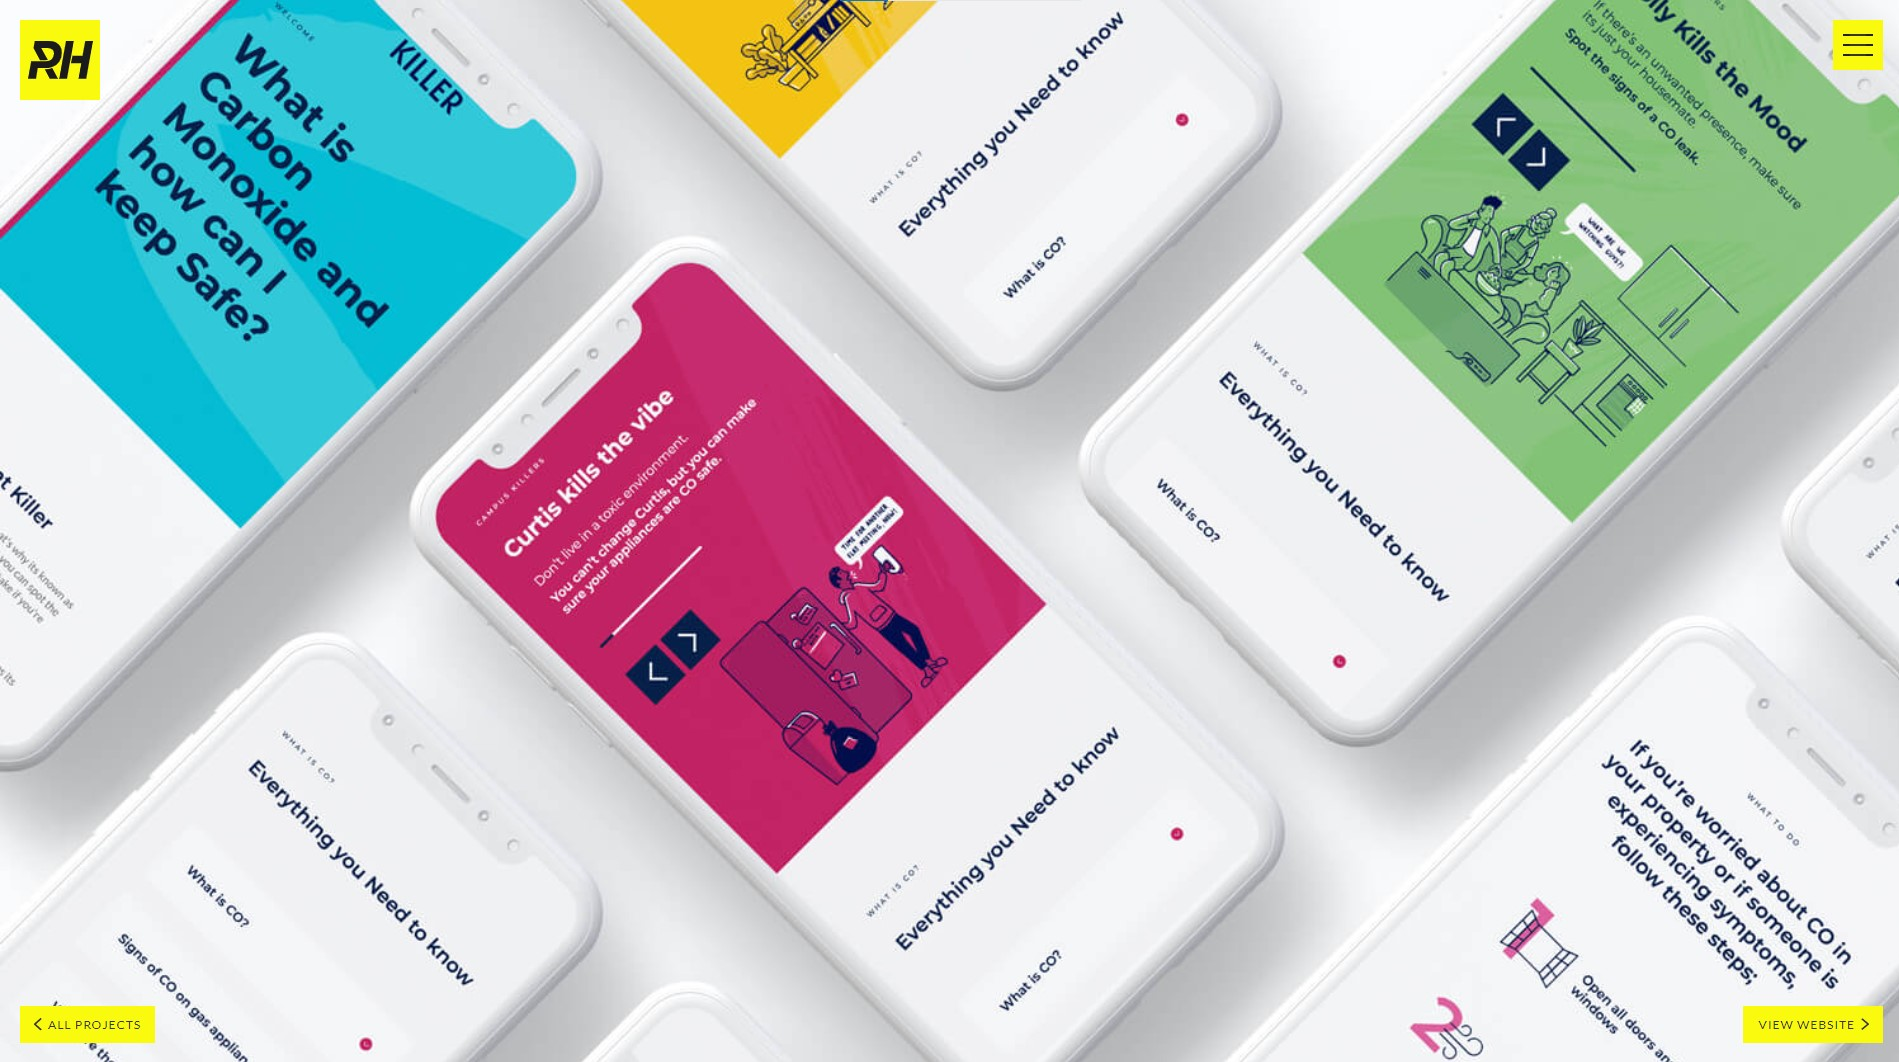 Orpetron Web Design Awards - Winner Sites (Jun 7–13) - Web Design Awards Inspiration Trends UI UX